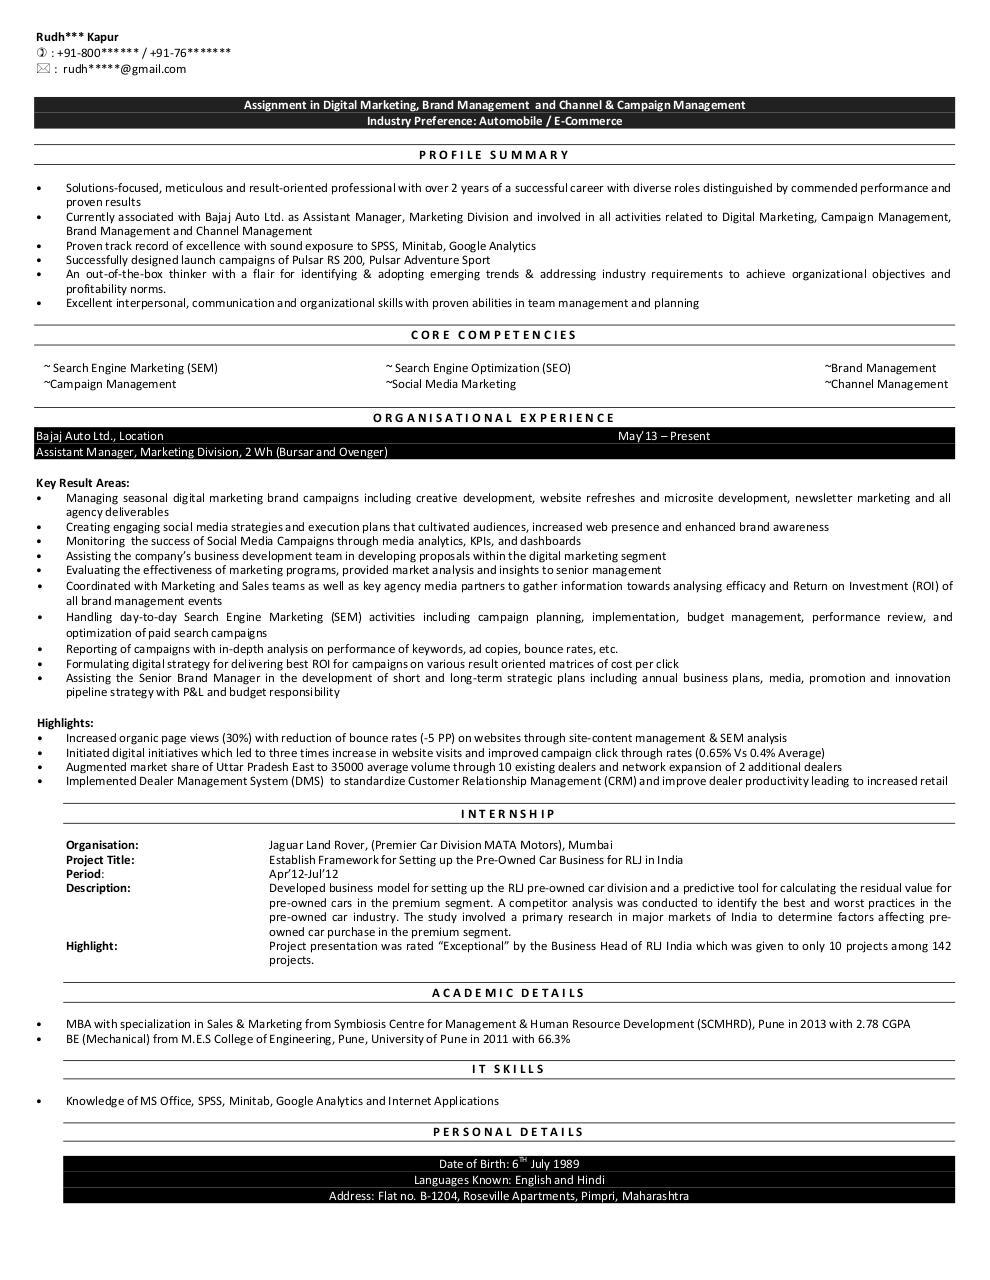 marketing objectives of bajaj pulsar Bajaj pulsar-marketing mix report - download as word doc (doc / docx), pdf file (pdf), text file (txt) or read online.